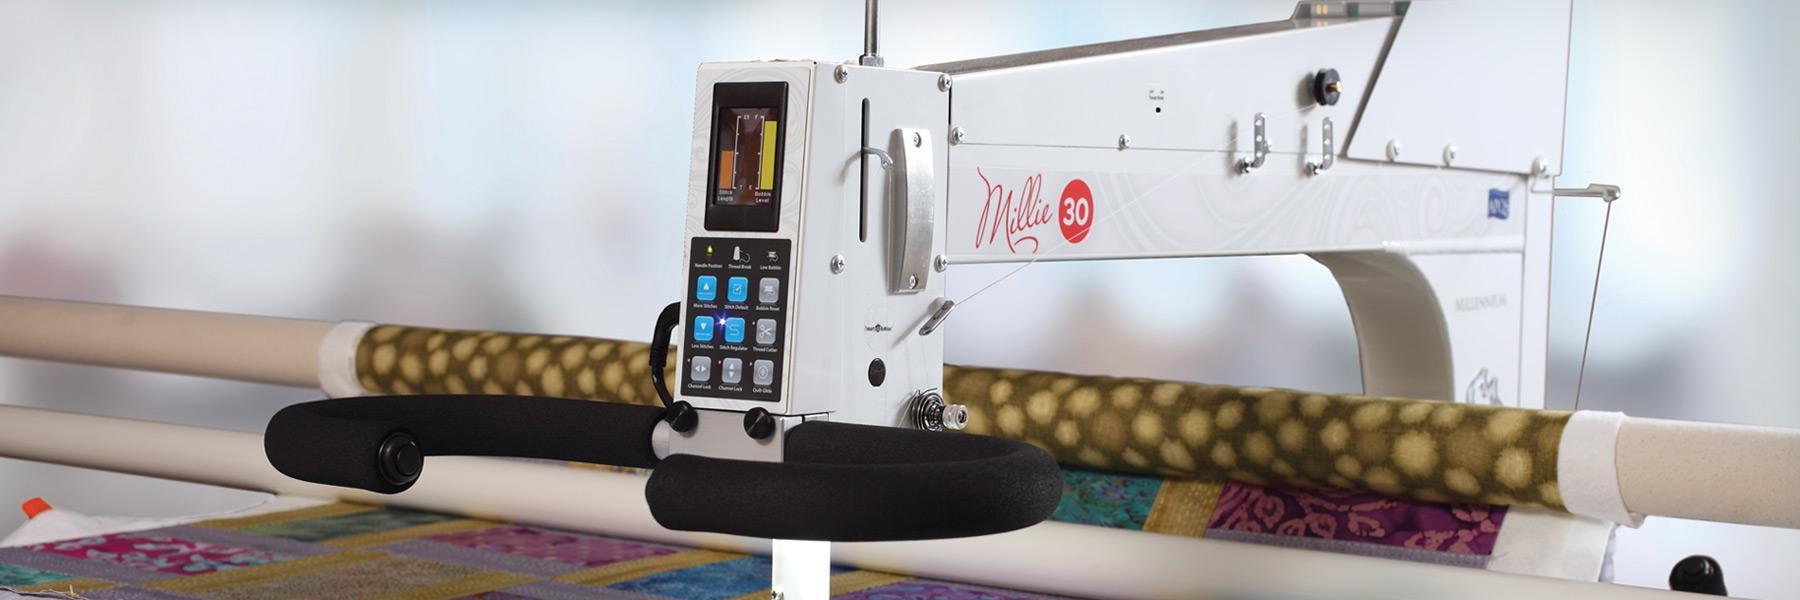 Millie30 - Hero Image of Quilting Machine